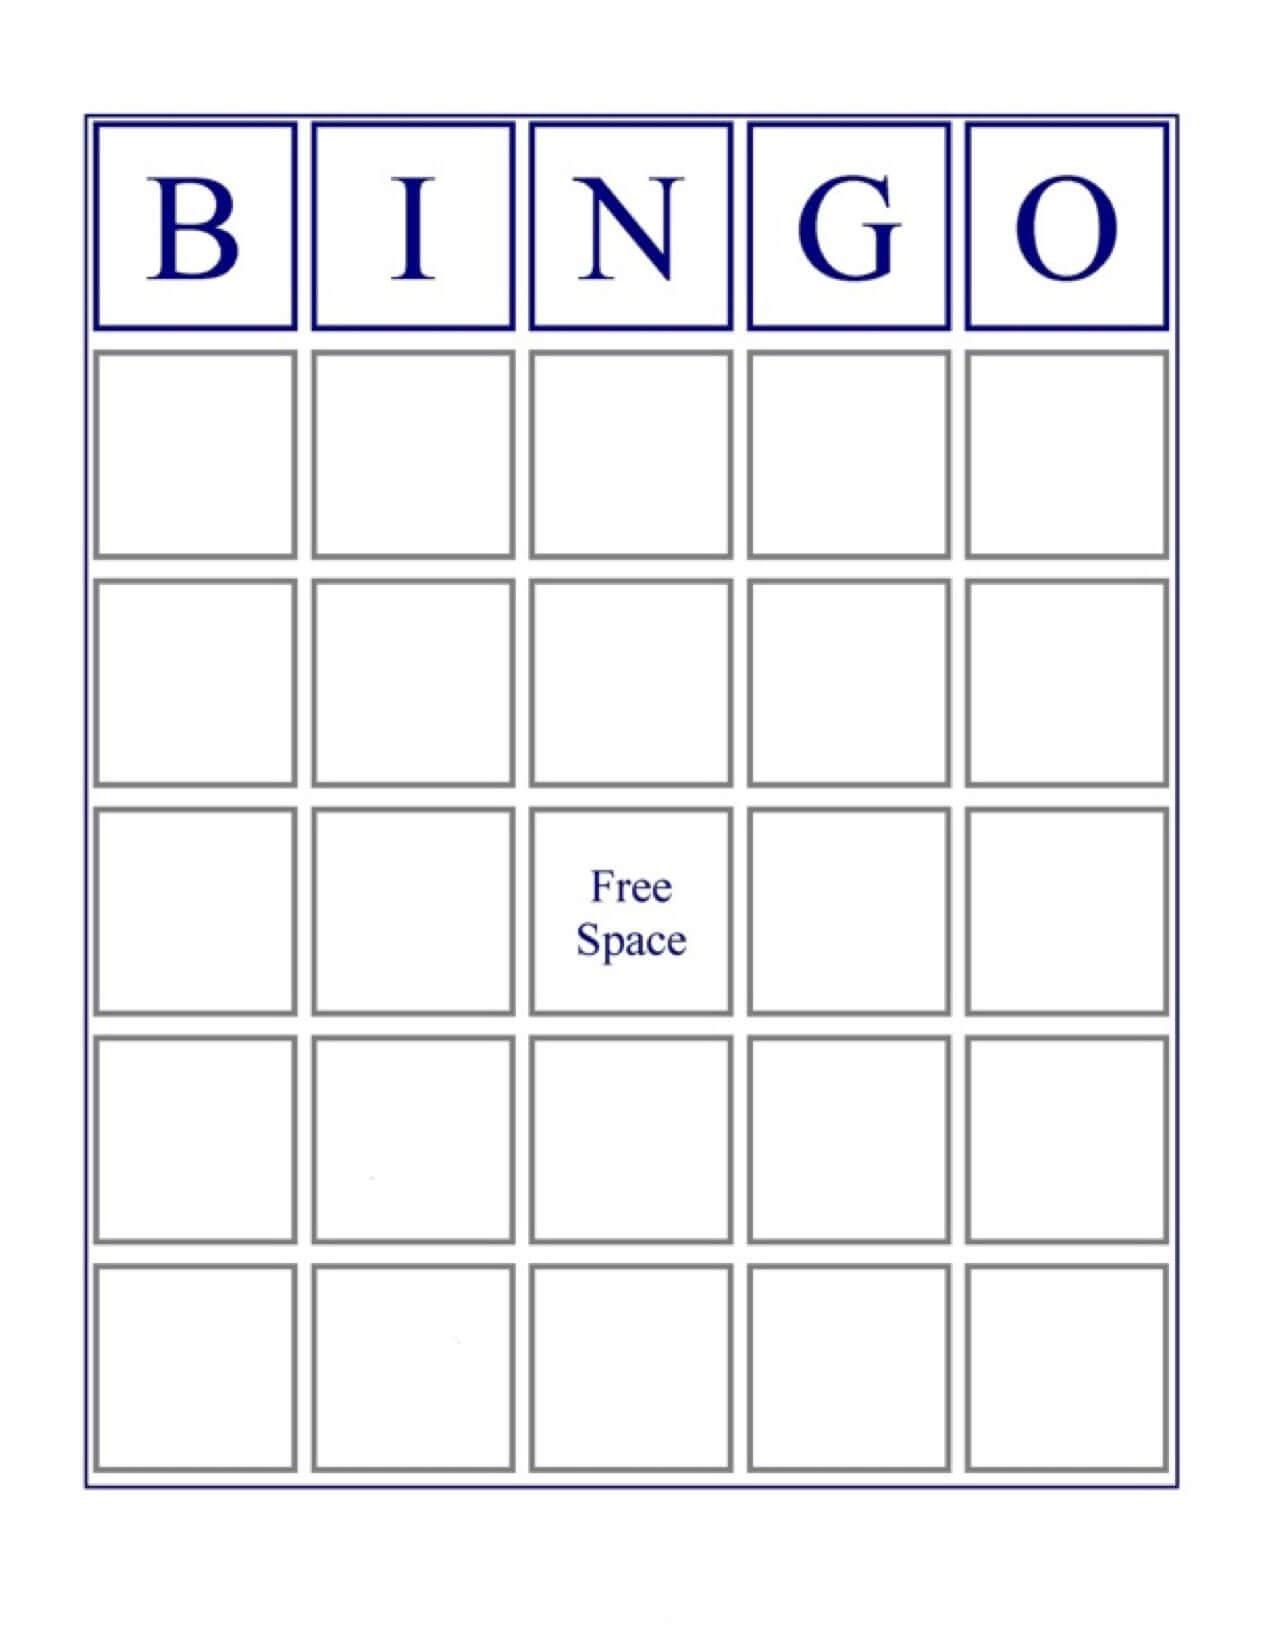 Esl Travel English Airport Activity: Bingo – I Had The For Blank Bingo Card Template Microsoft Word